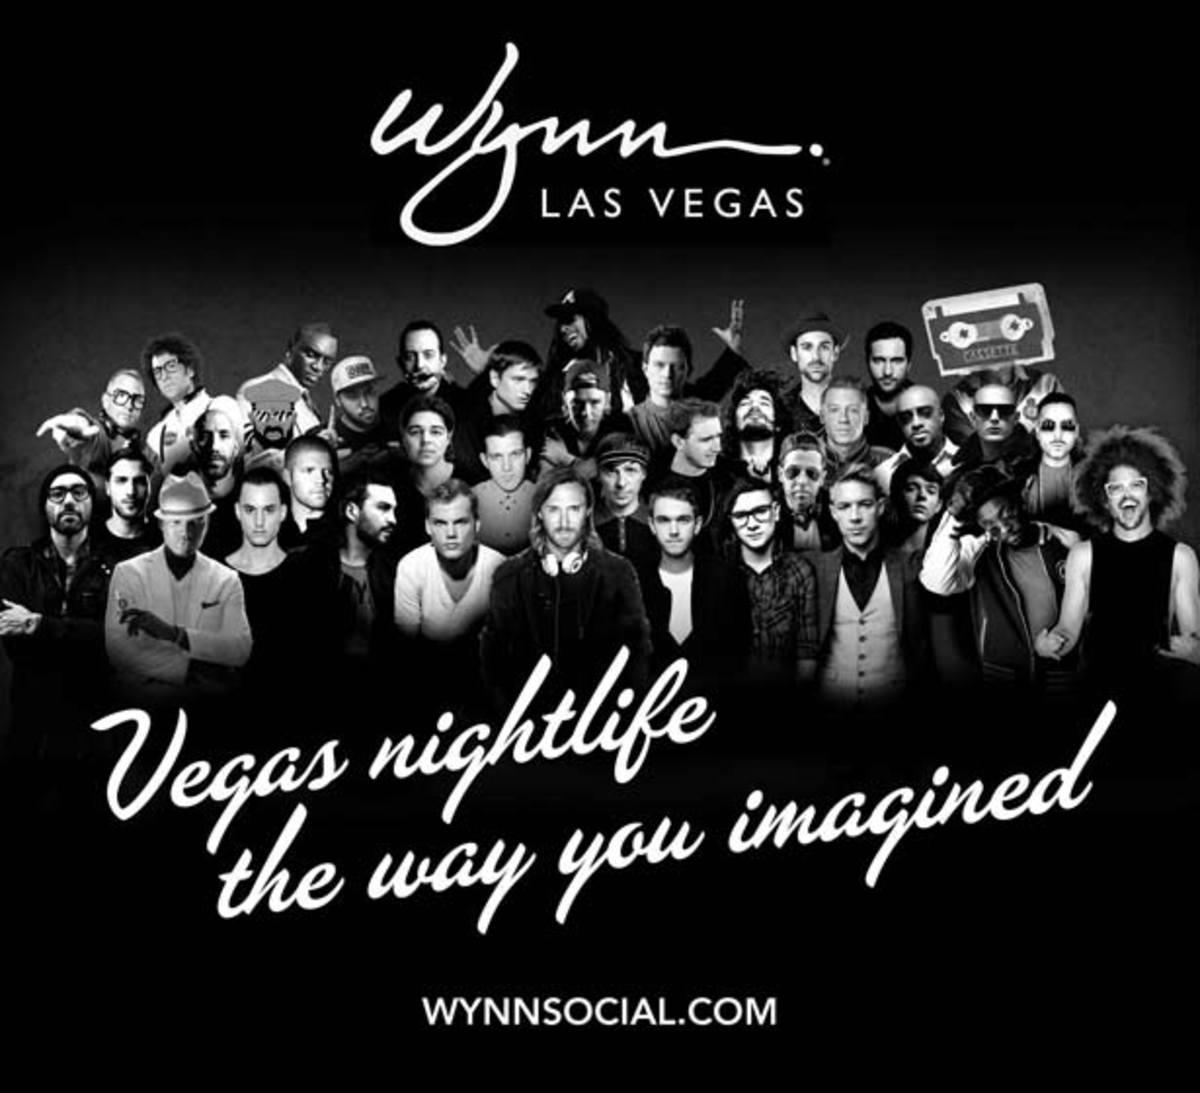 Las Vegas' Wynn Hotel And Casino Announces Epic 2014 DJ Residency List - EDM News